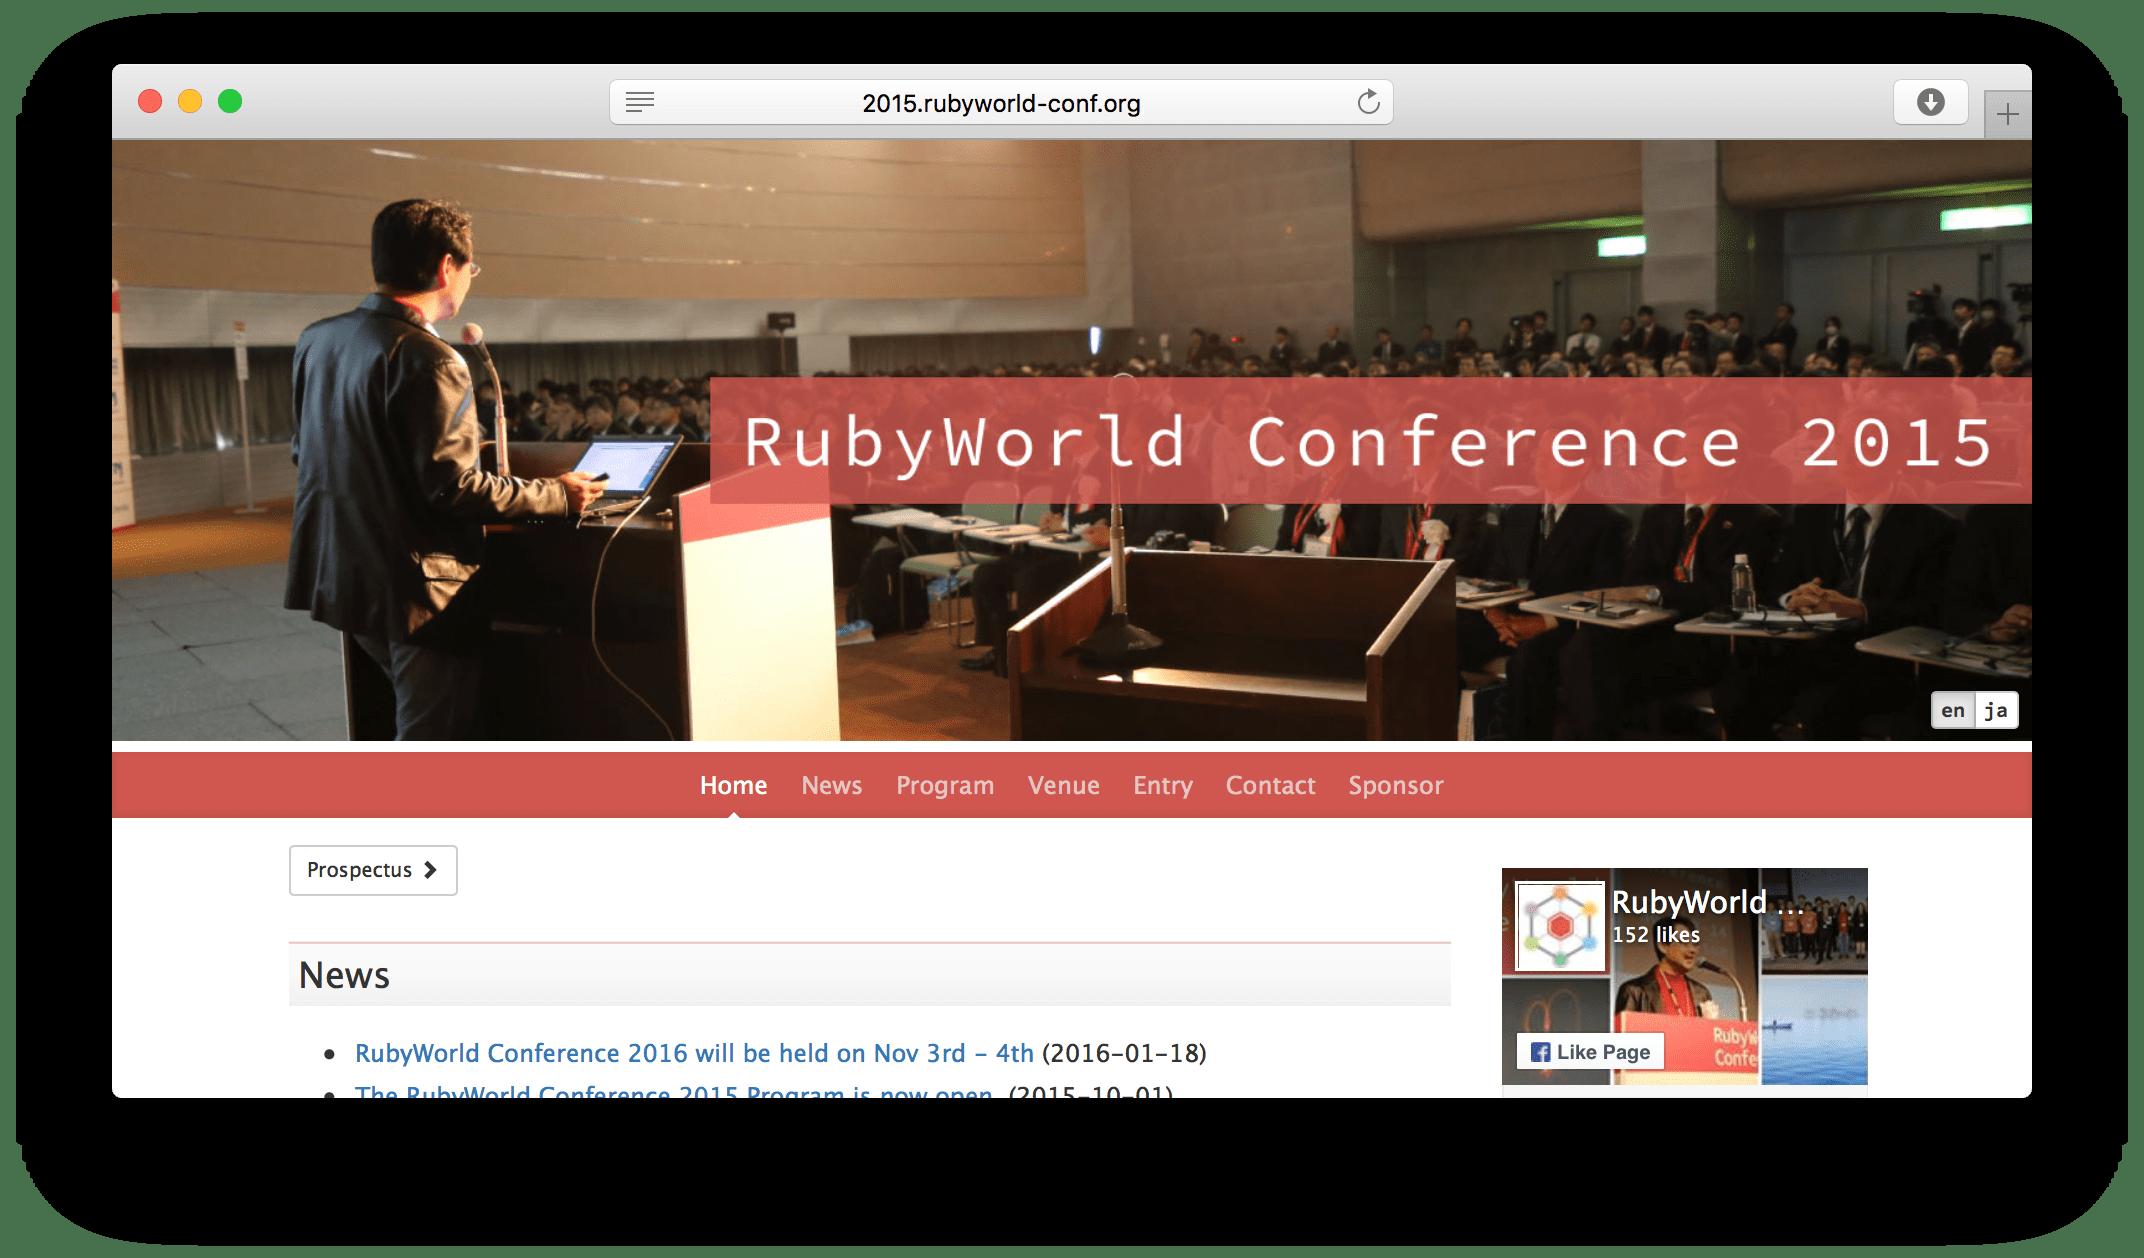 RubyWorld website screenshot